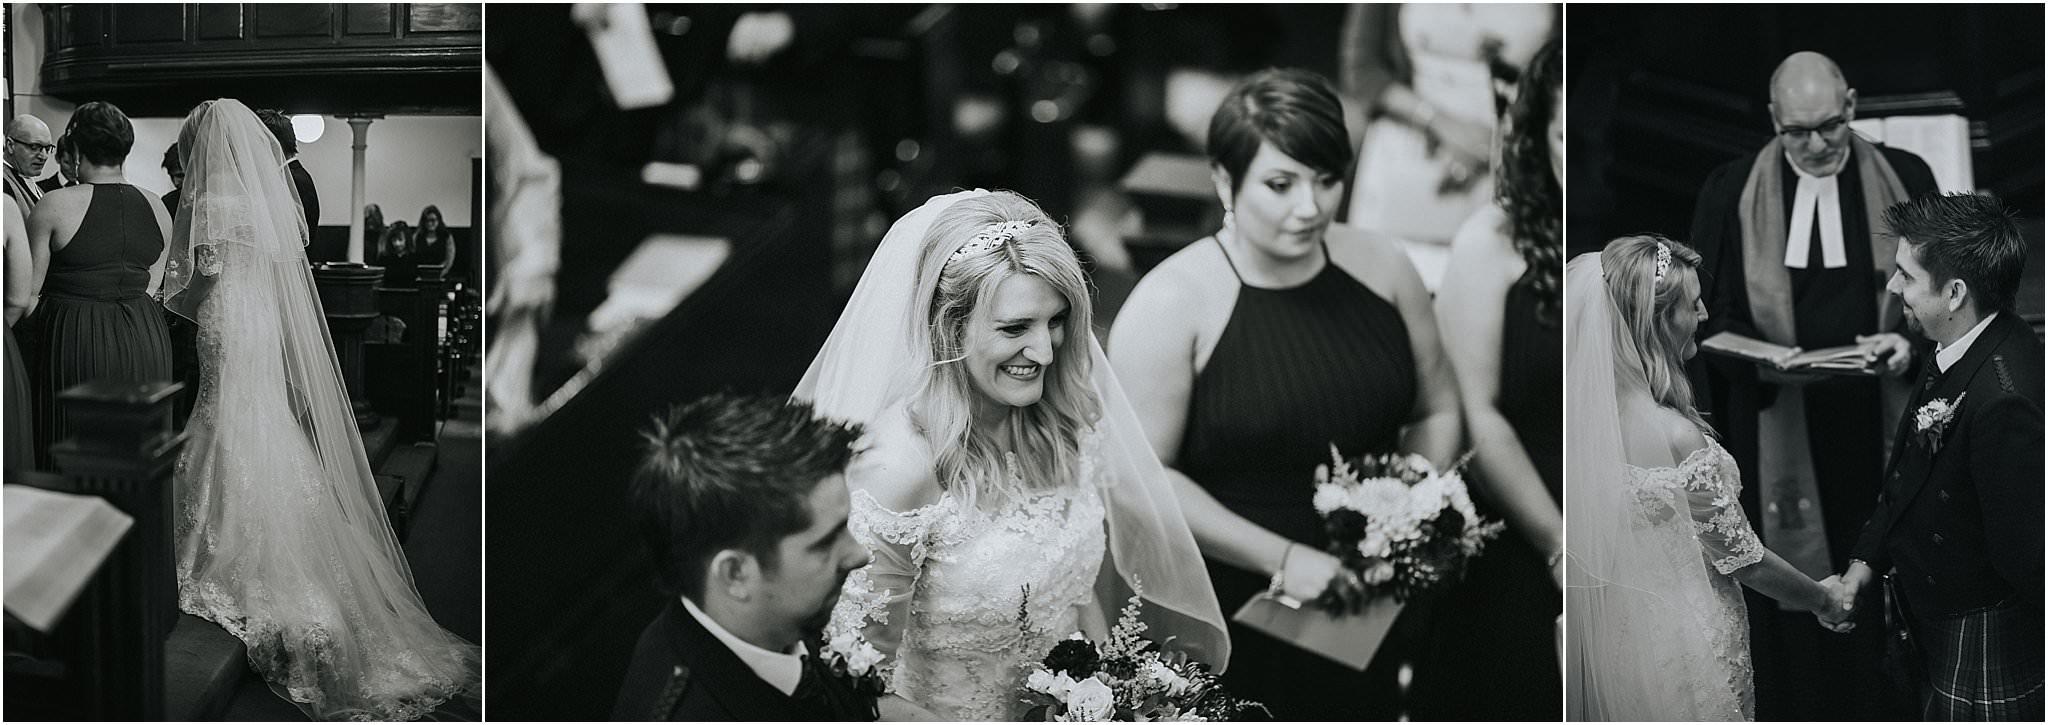 janie-garry-wedding19.jpg